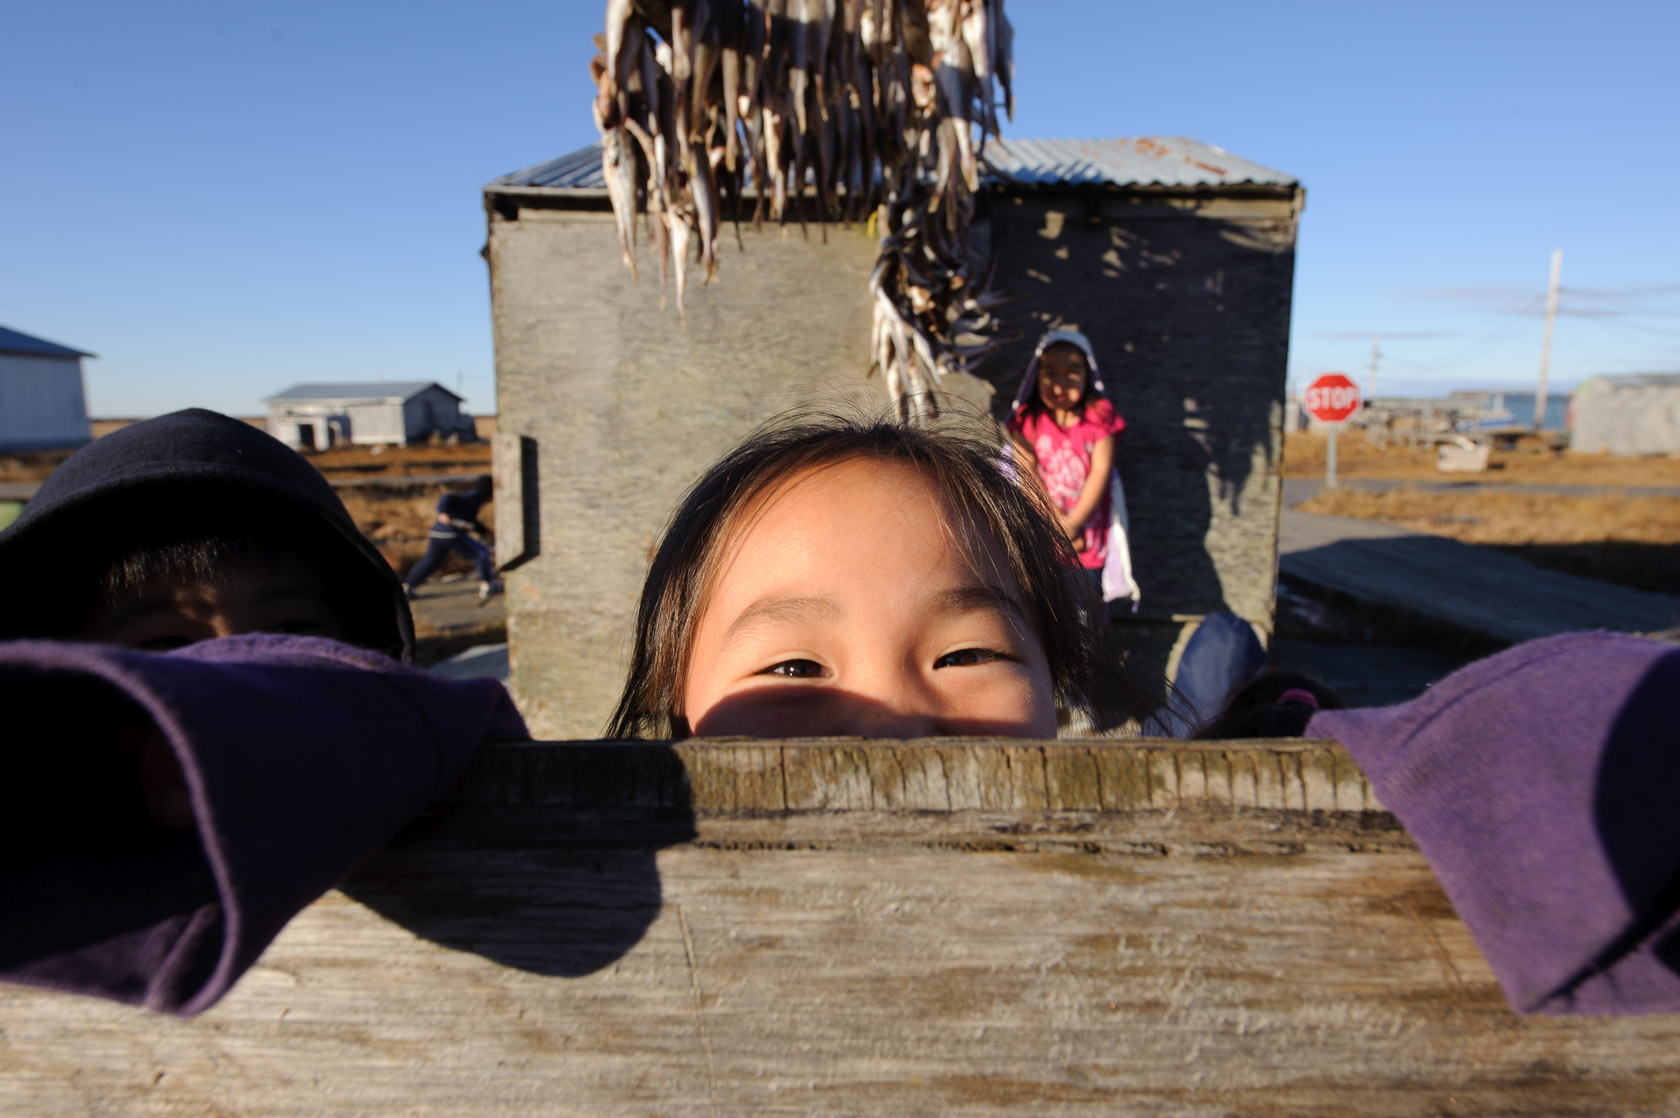 Drying fish and kids, Kongiganak, Alaska